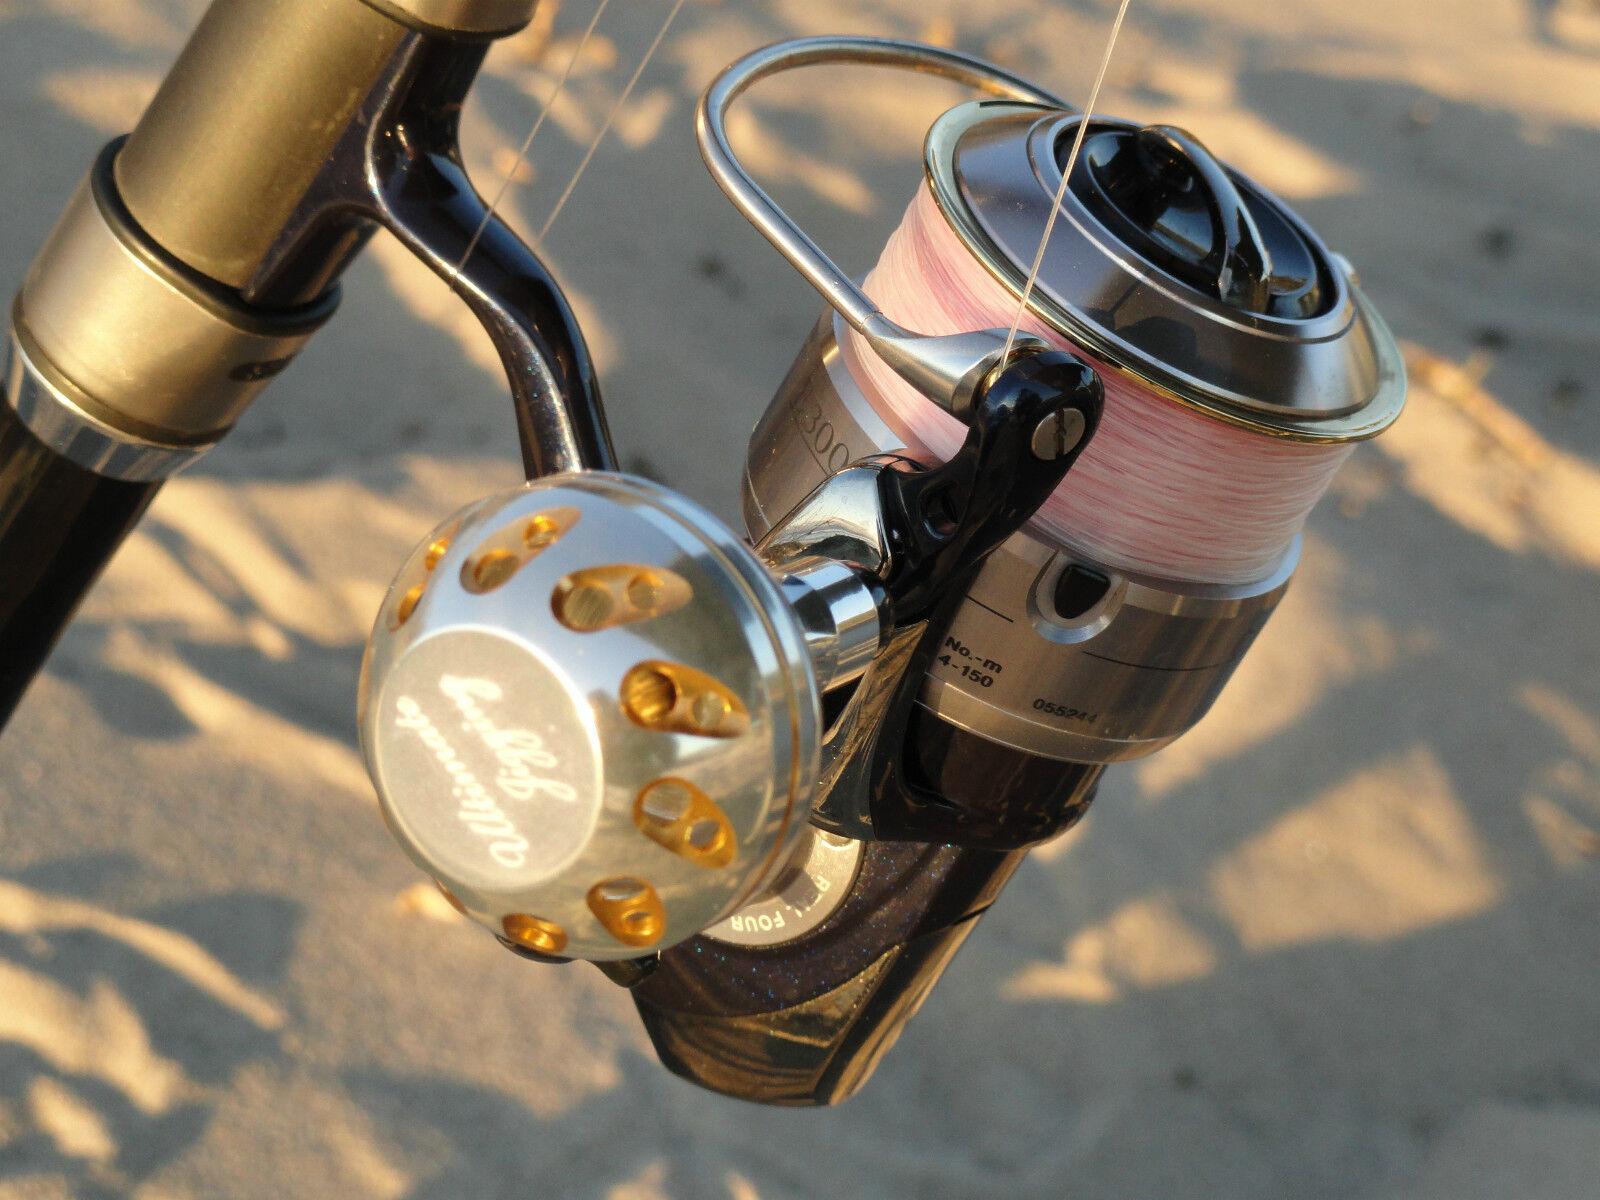 Ultimate Jigging Jigging Jigging PRK 40mm Knob D cup for DAIWA Saltiga Game Certate reel Blau/SV 240228